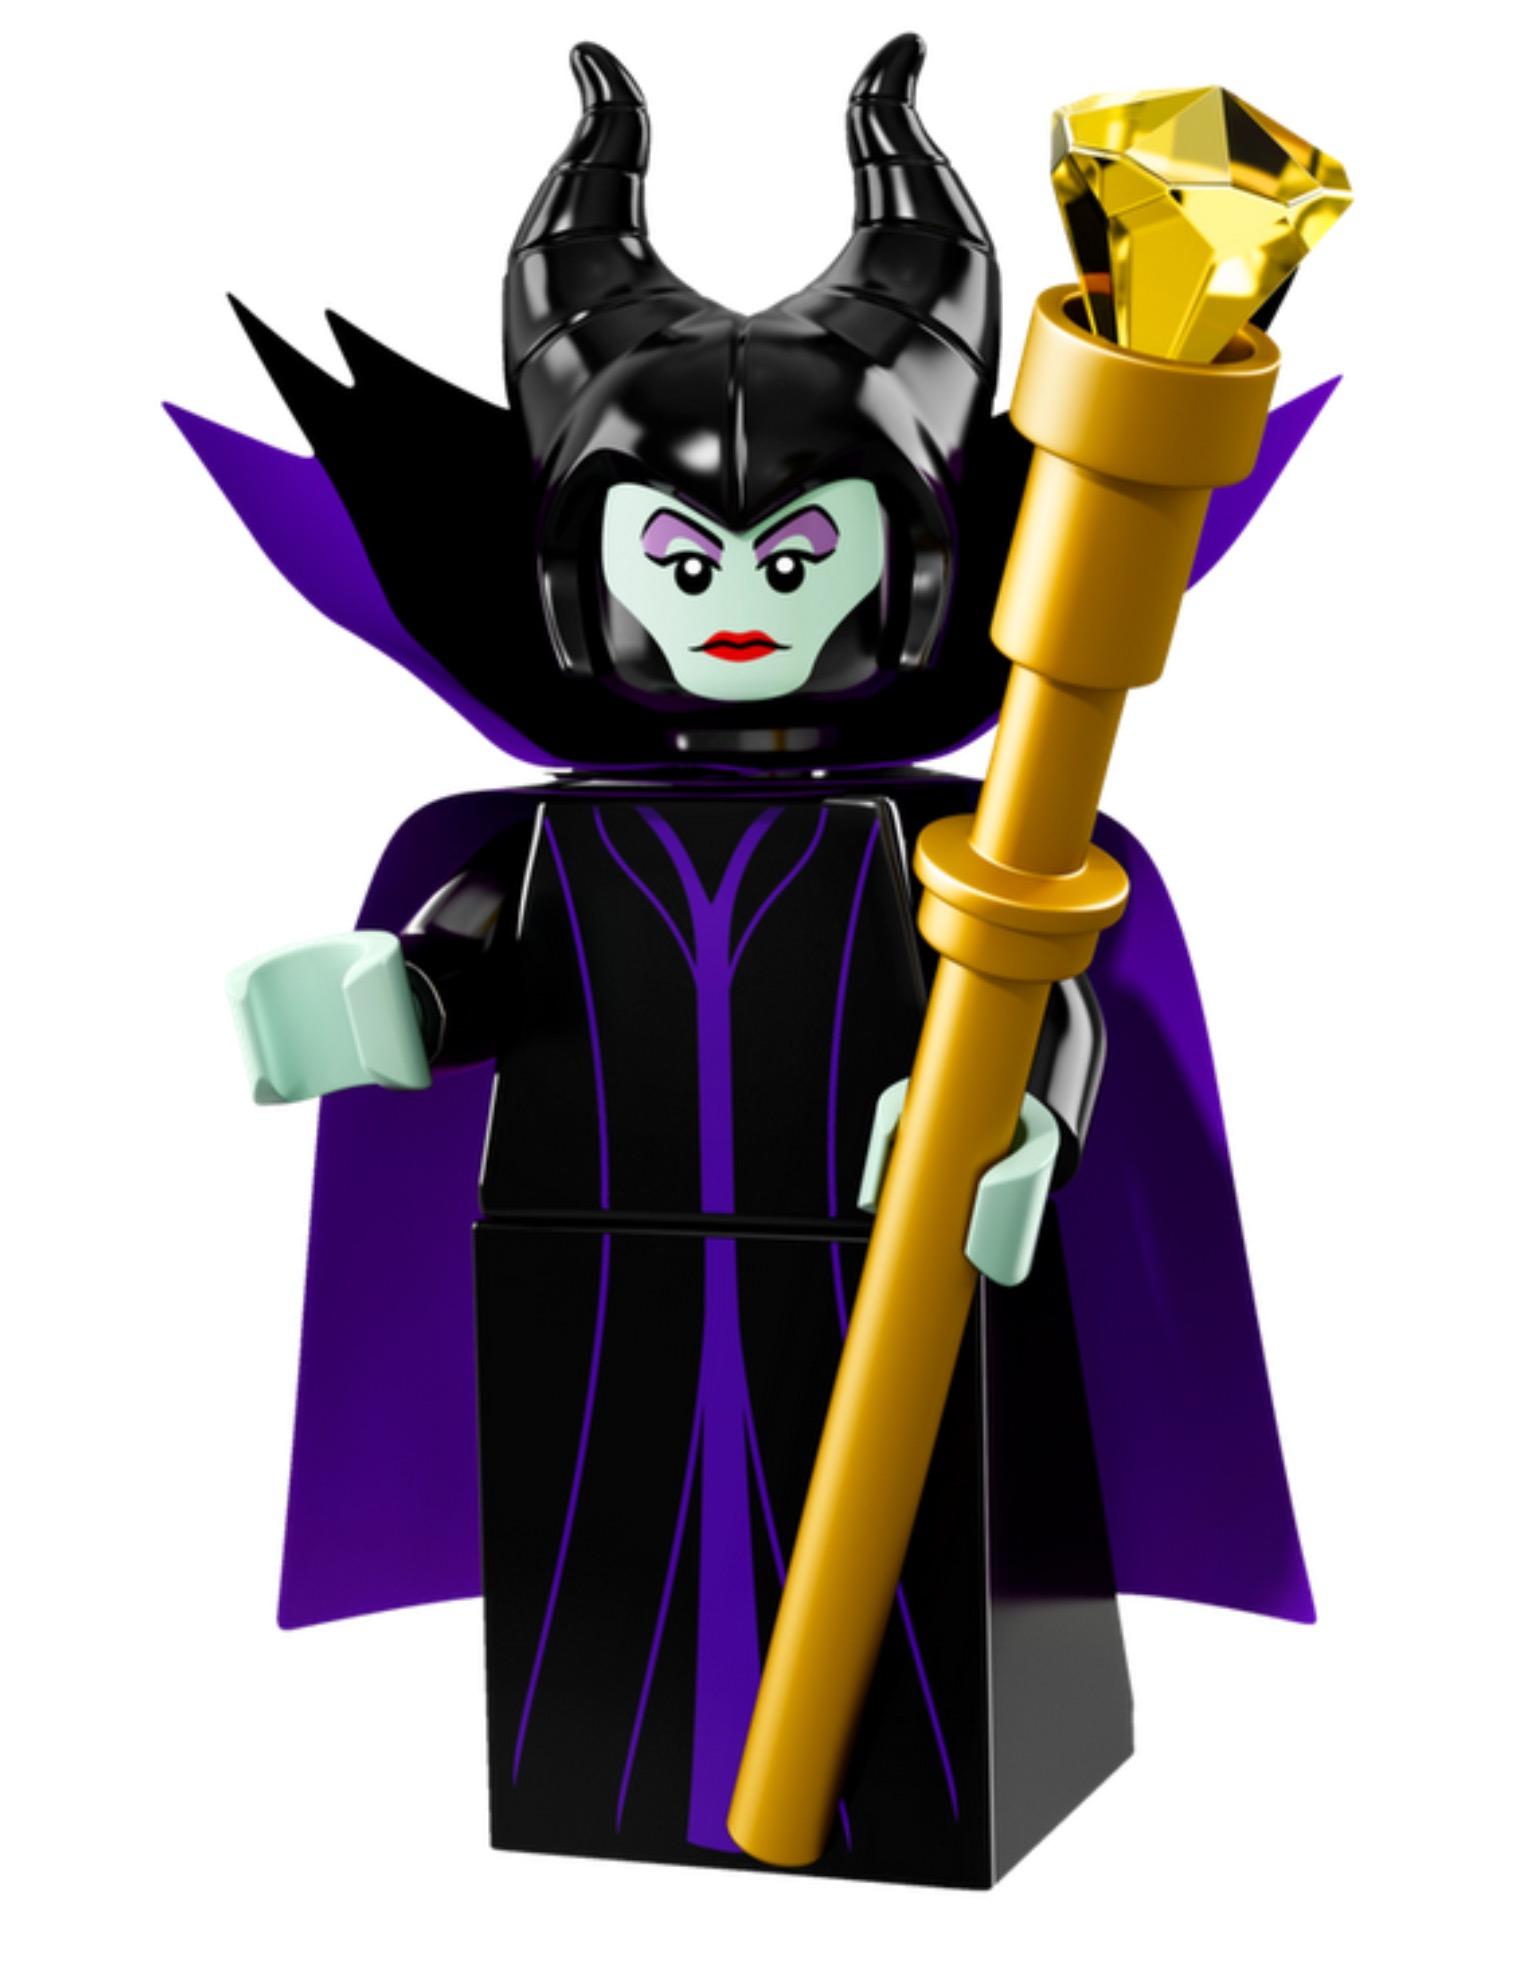 Lego Maleficent Minifigure Bricker - Const...